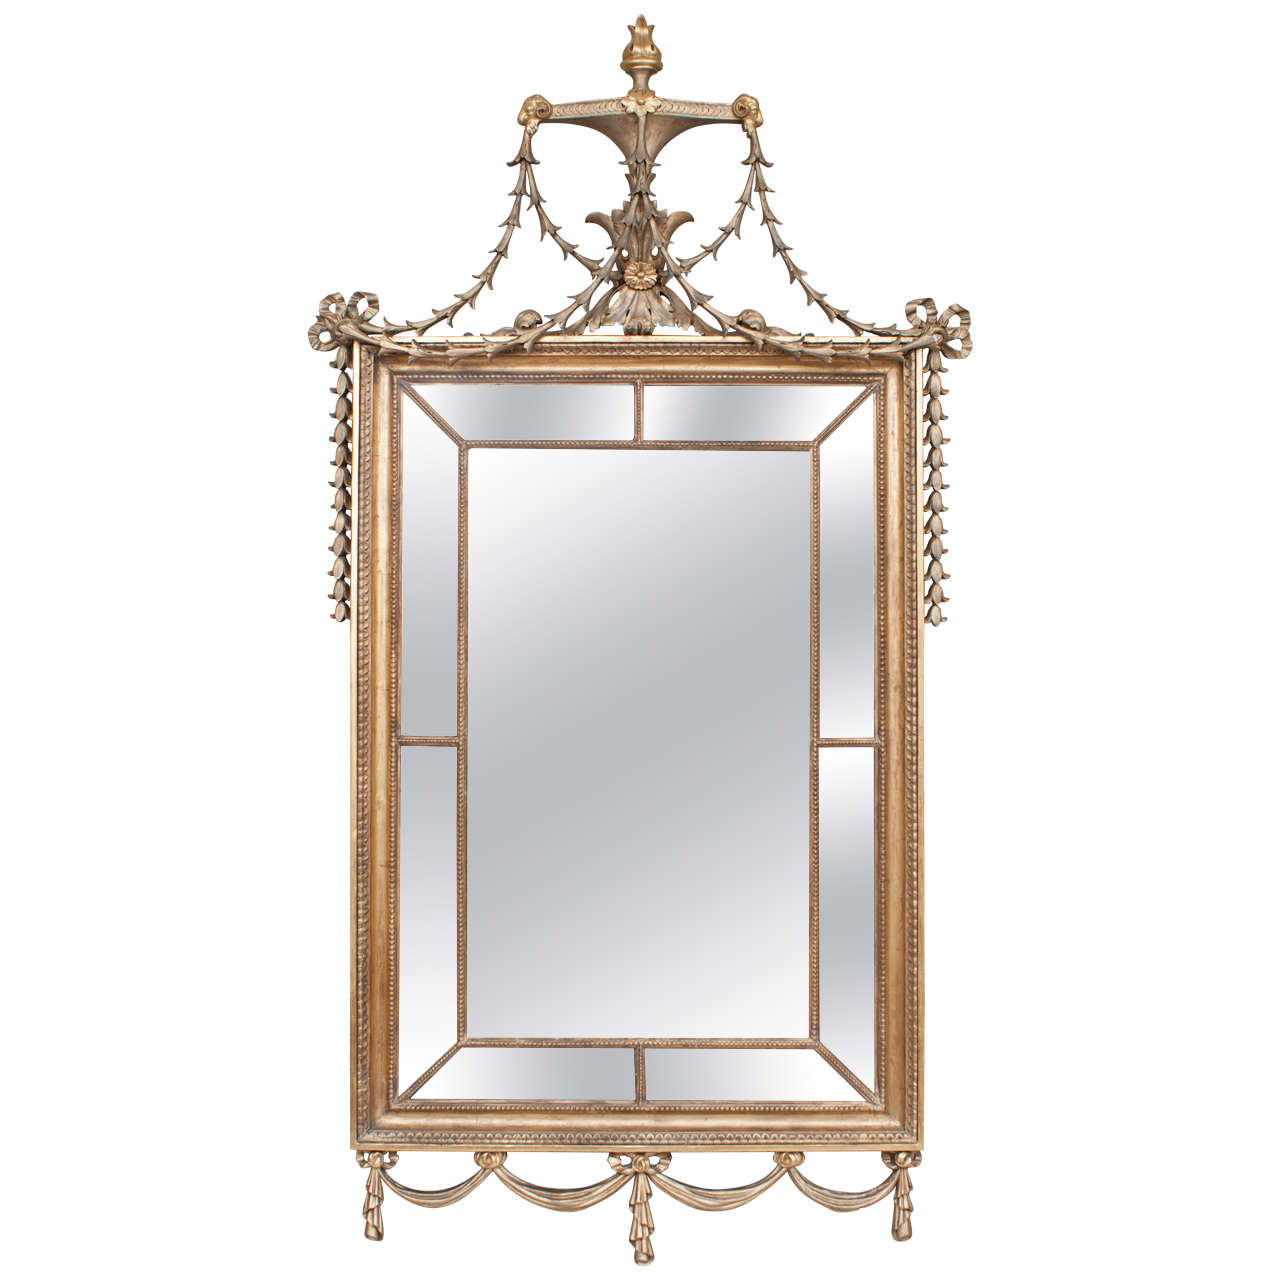 English Regency Adam Style Giltwood Mirror, circa 1815